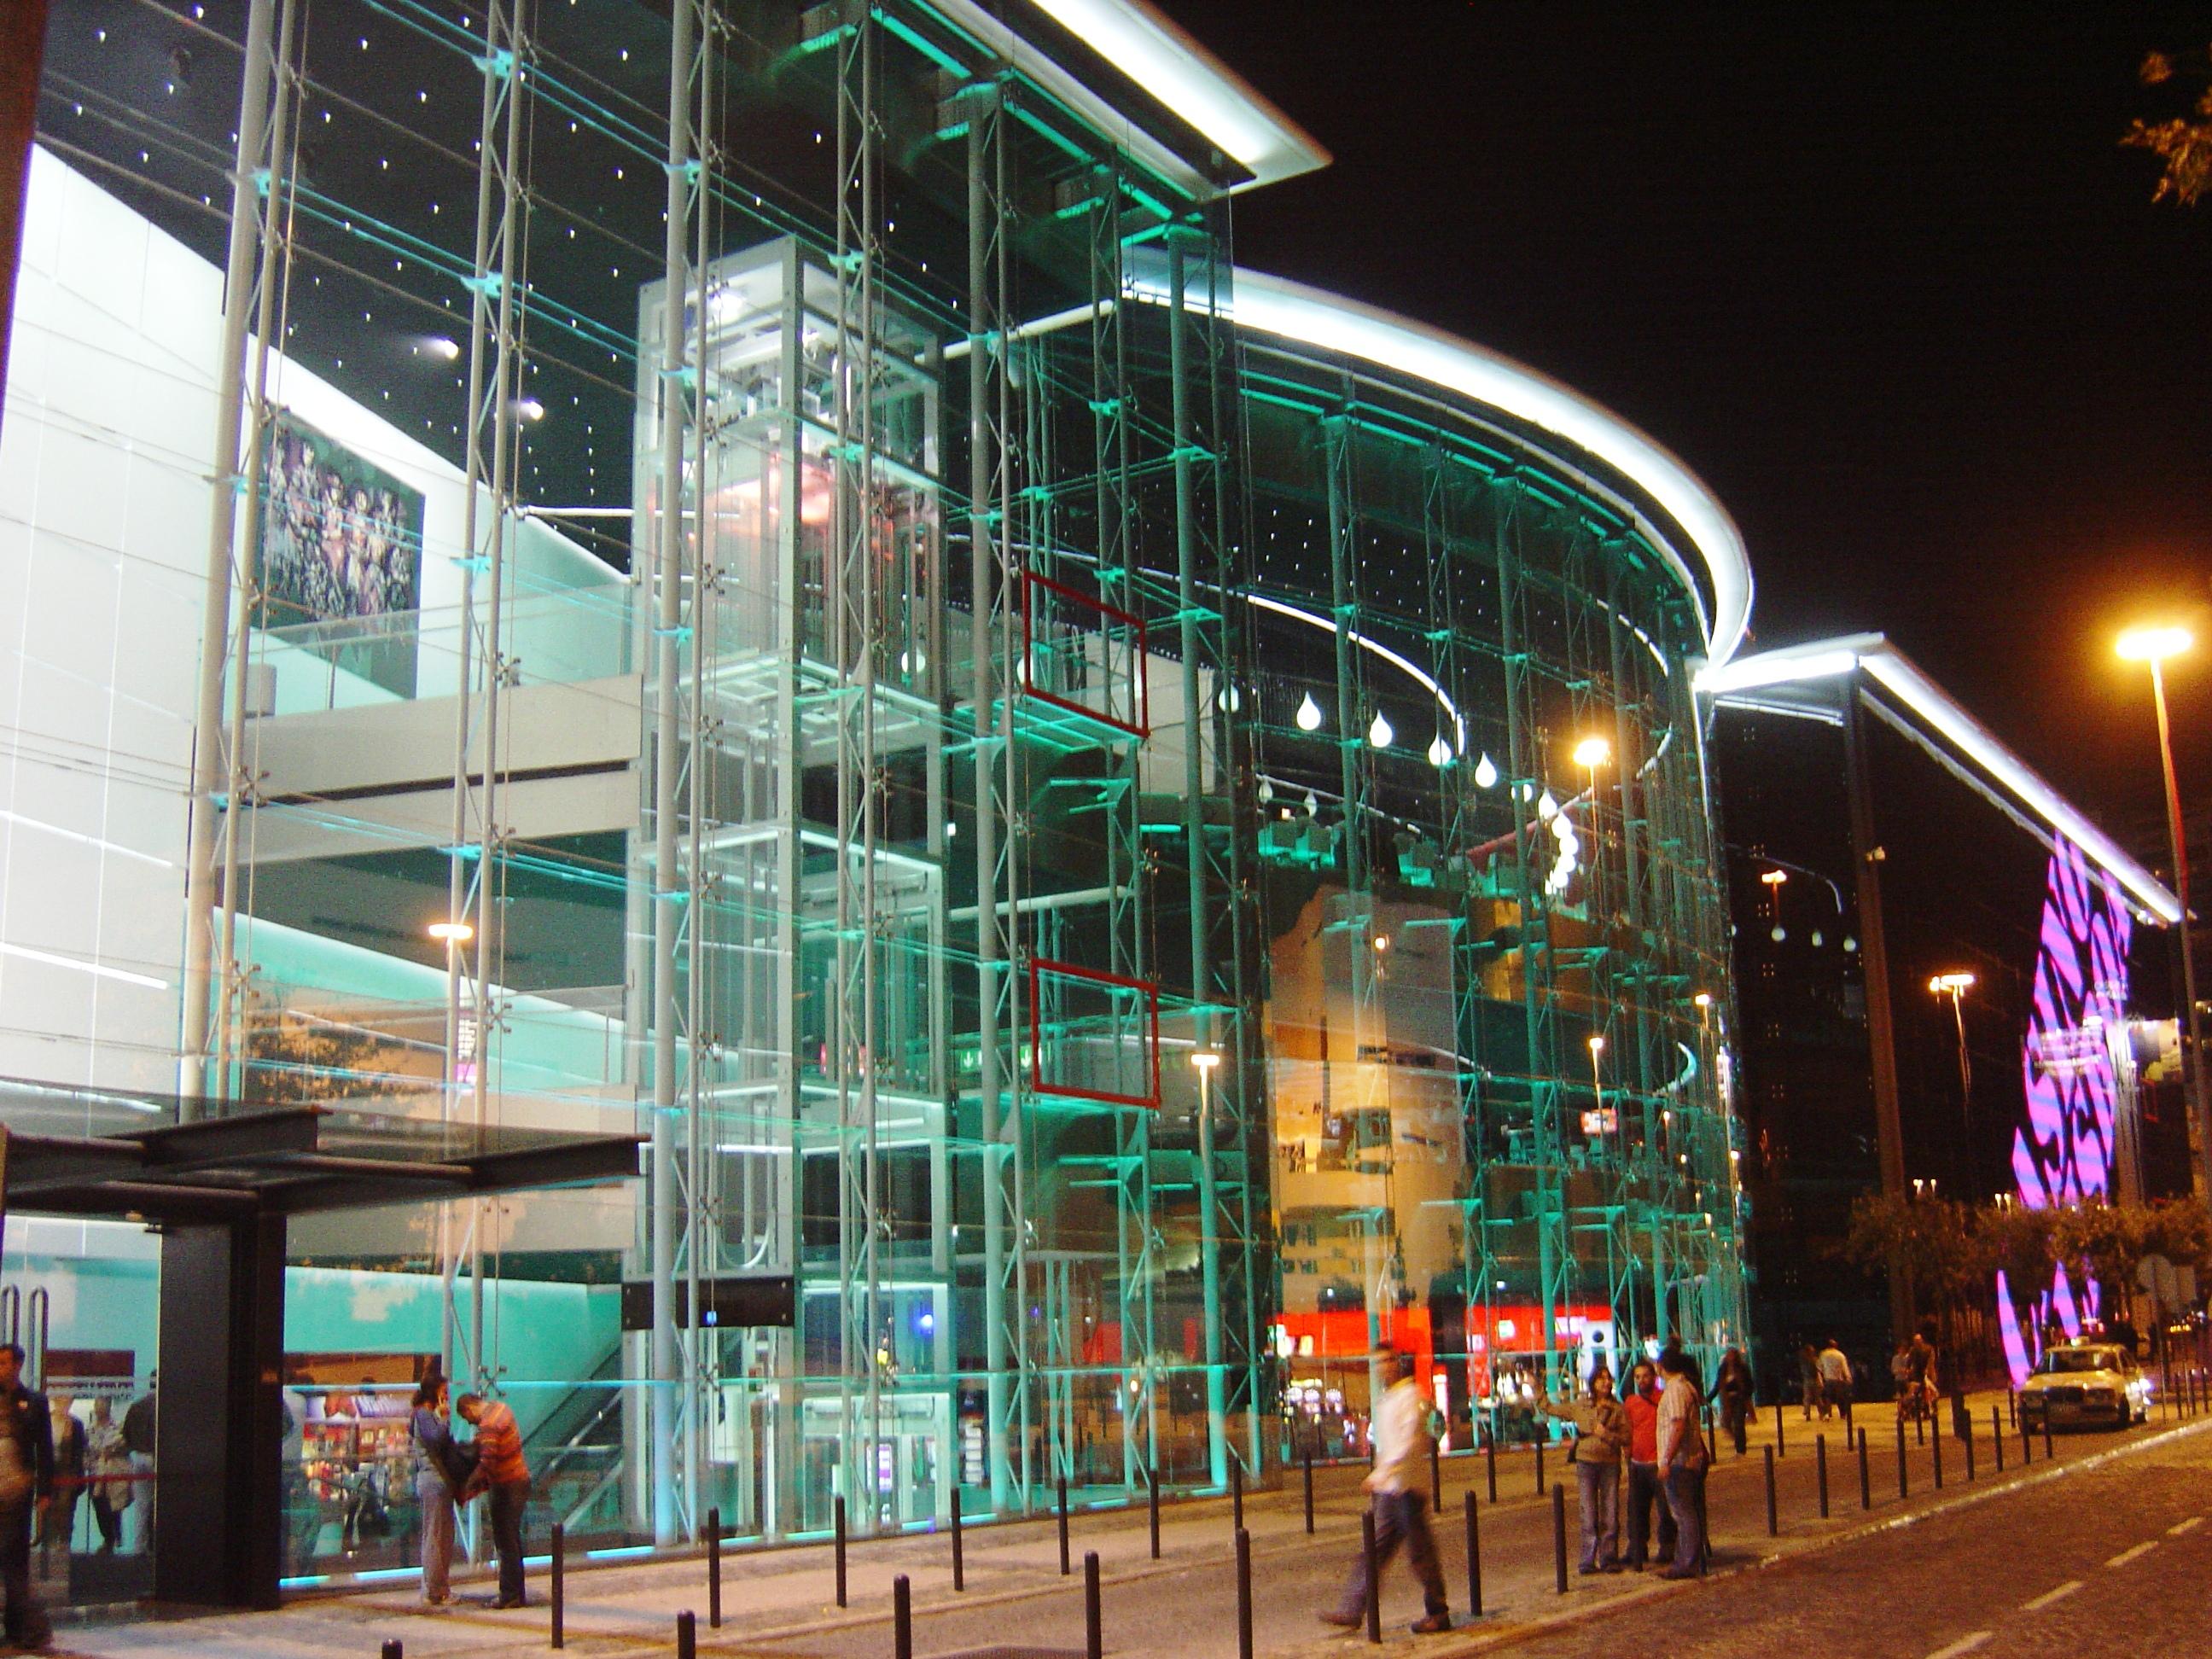 Casinos principal Lisboa profissional 56162